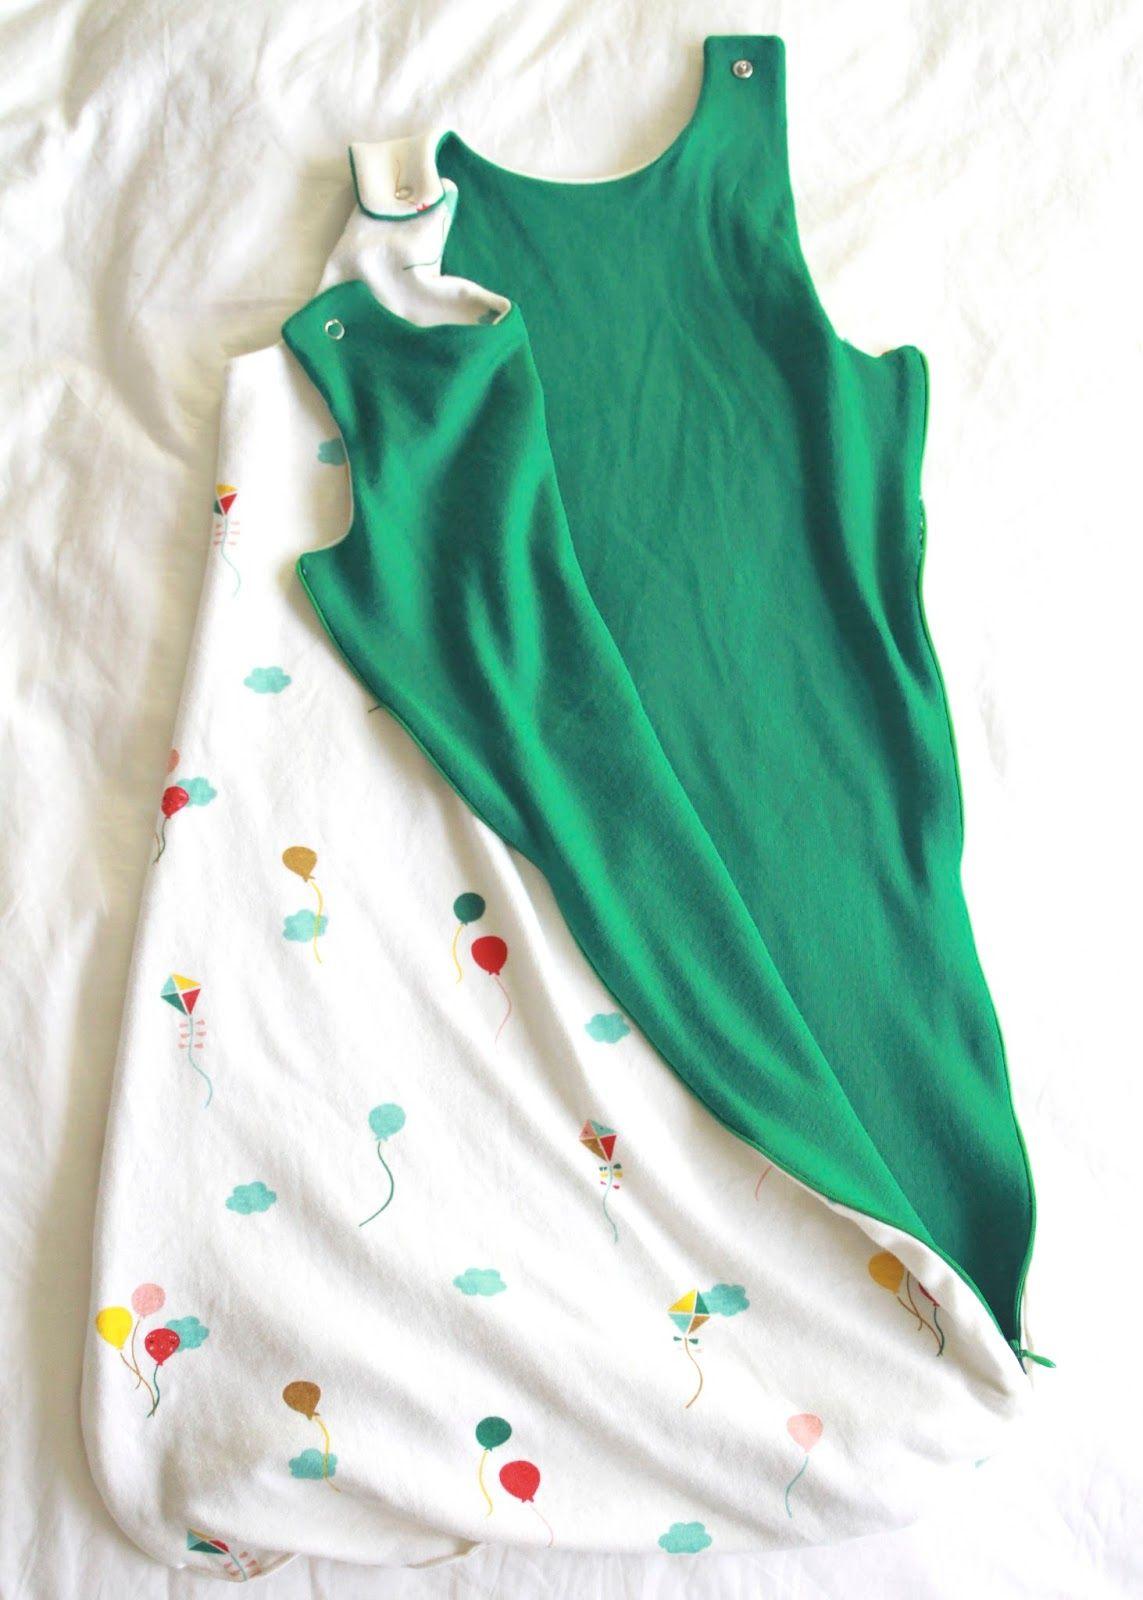 DIY Merino Wool Infant Sleep Sack From The Lua Pattern By Straight Grain